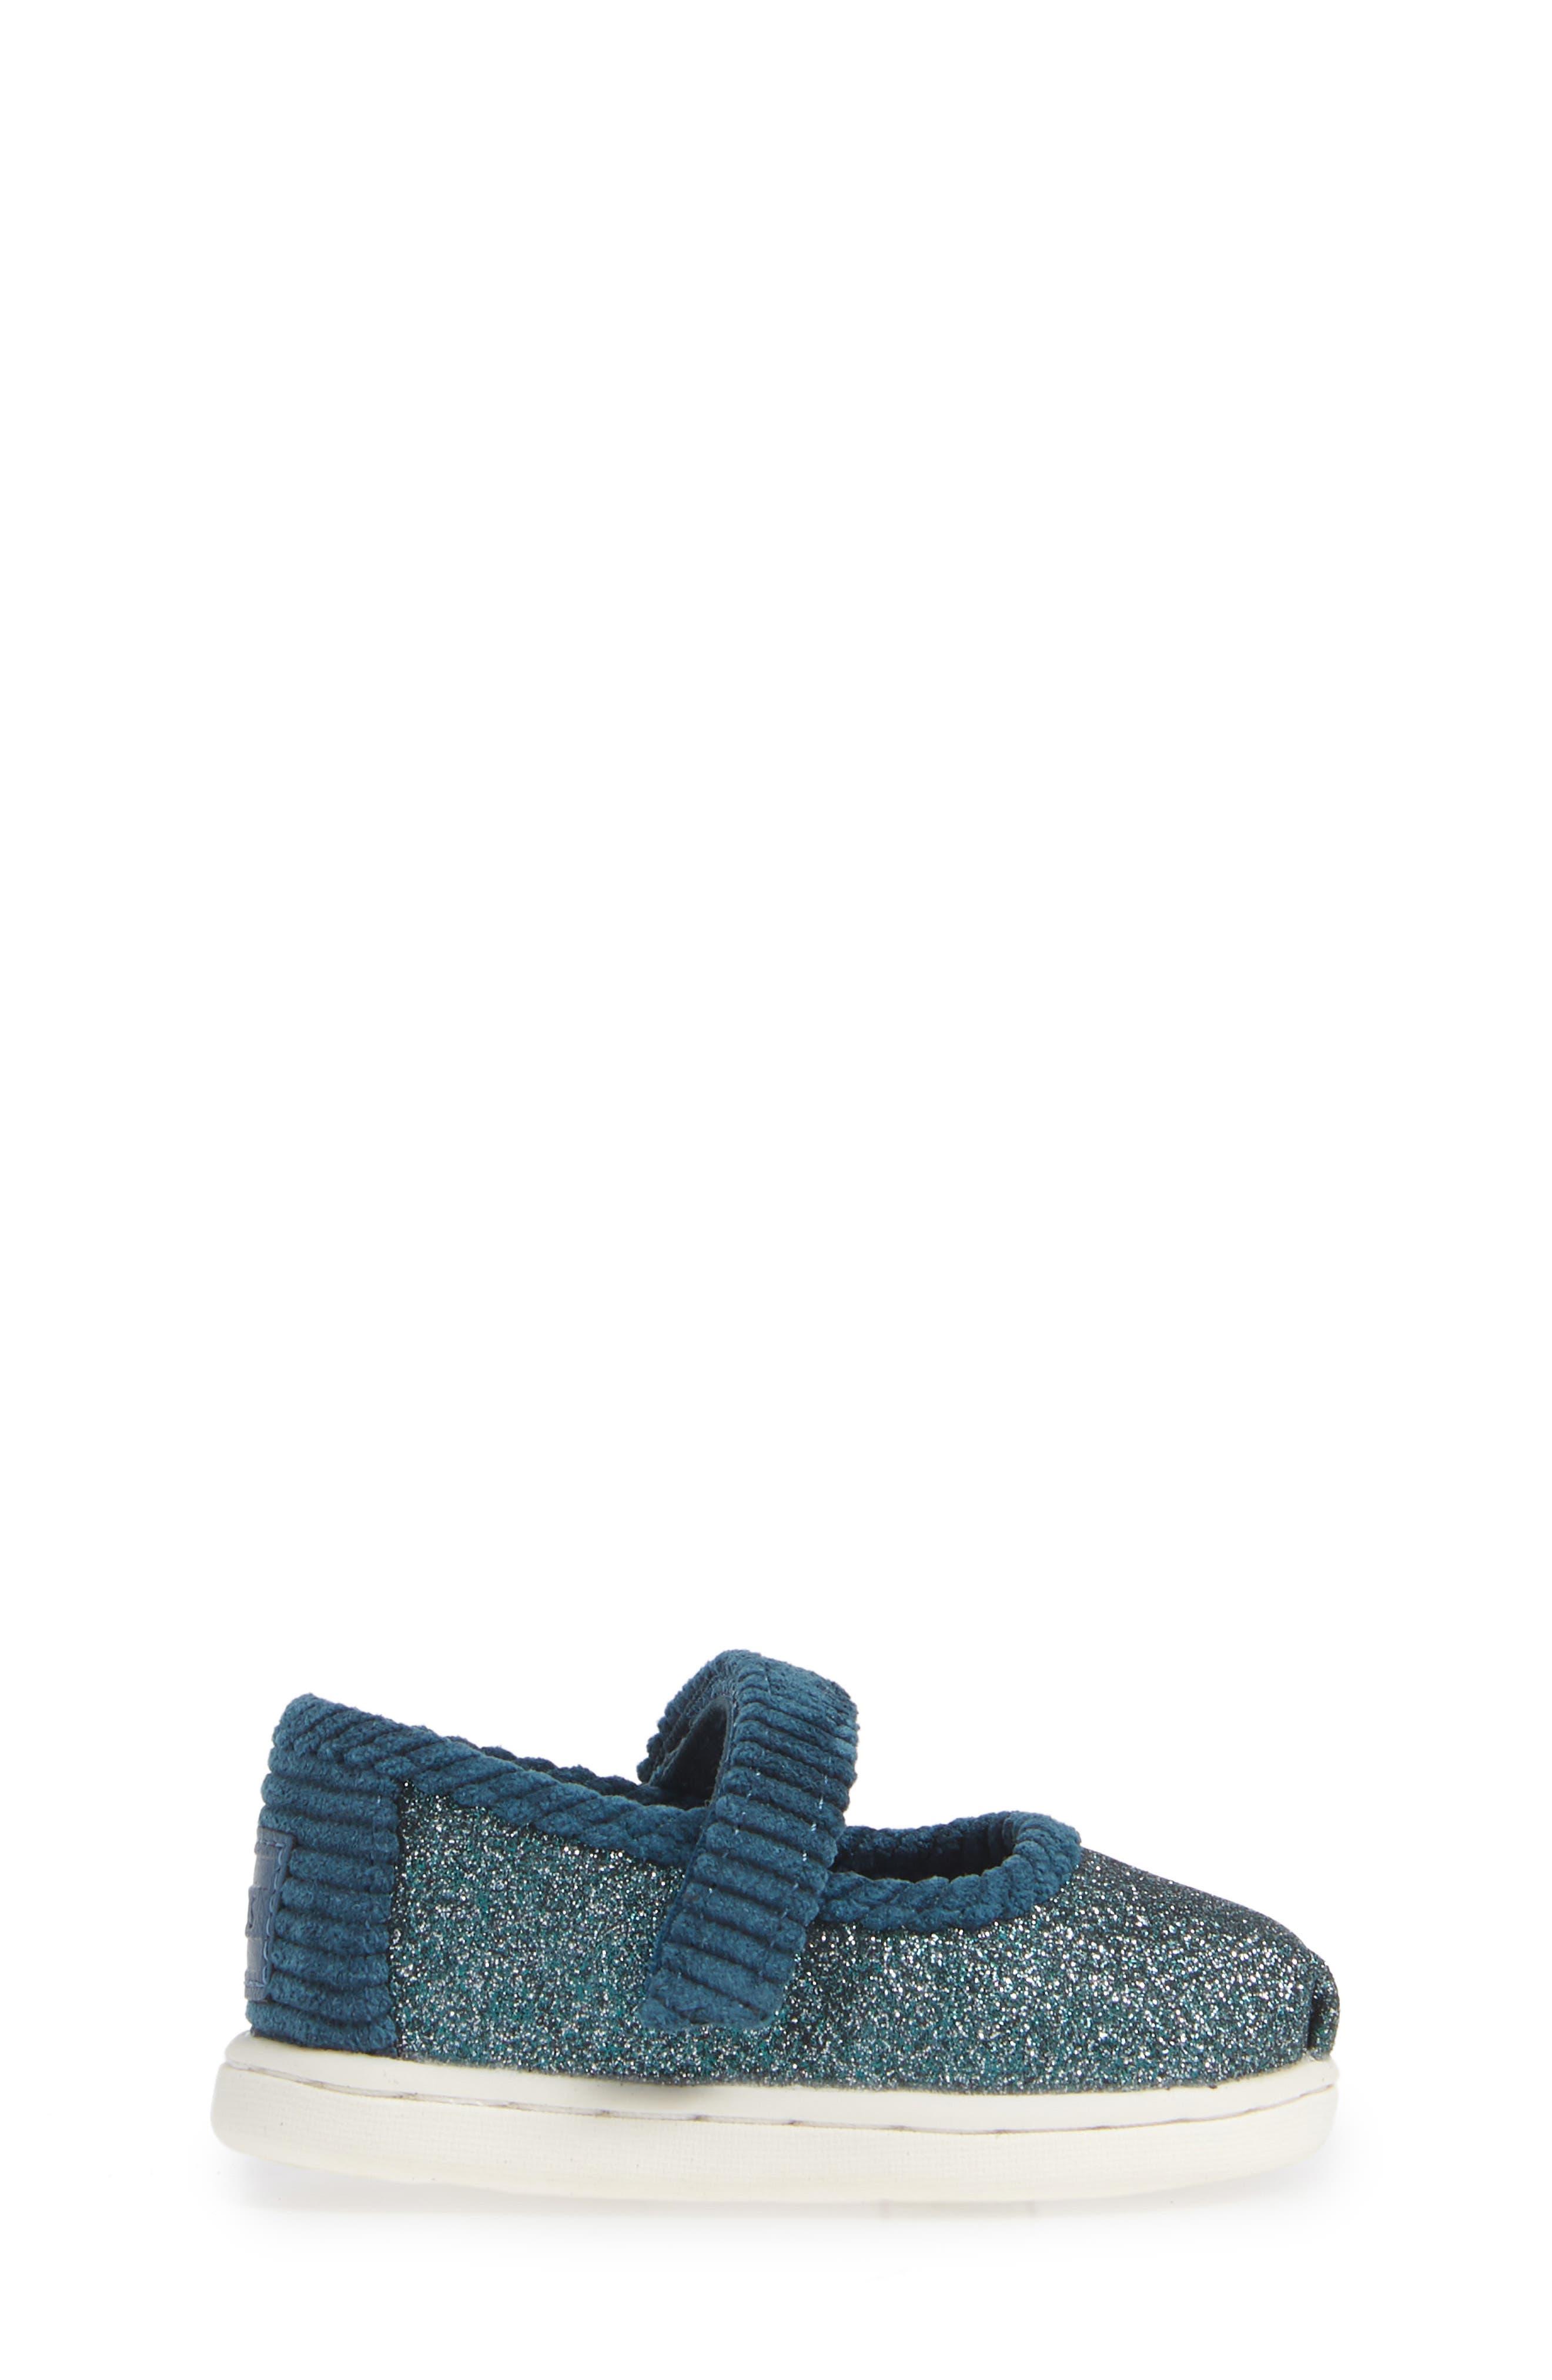 Mary Jane Sneaker,                             Alternate thumbnail 3, color,                             ATLANTIC IRIDESCENT/ CORDUROY